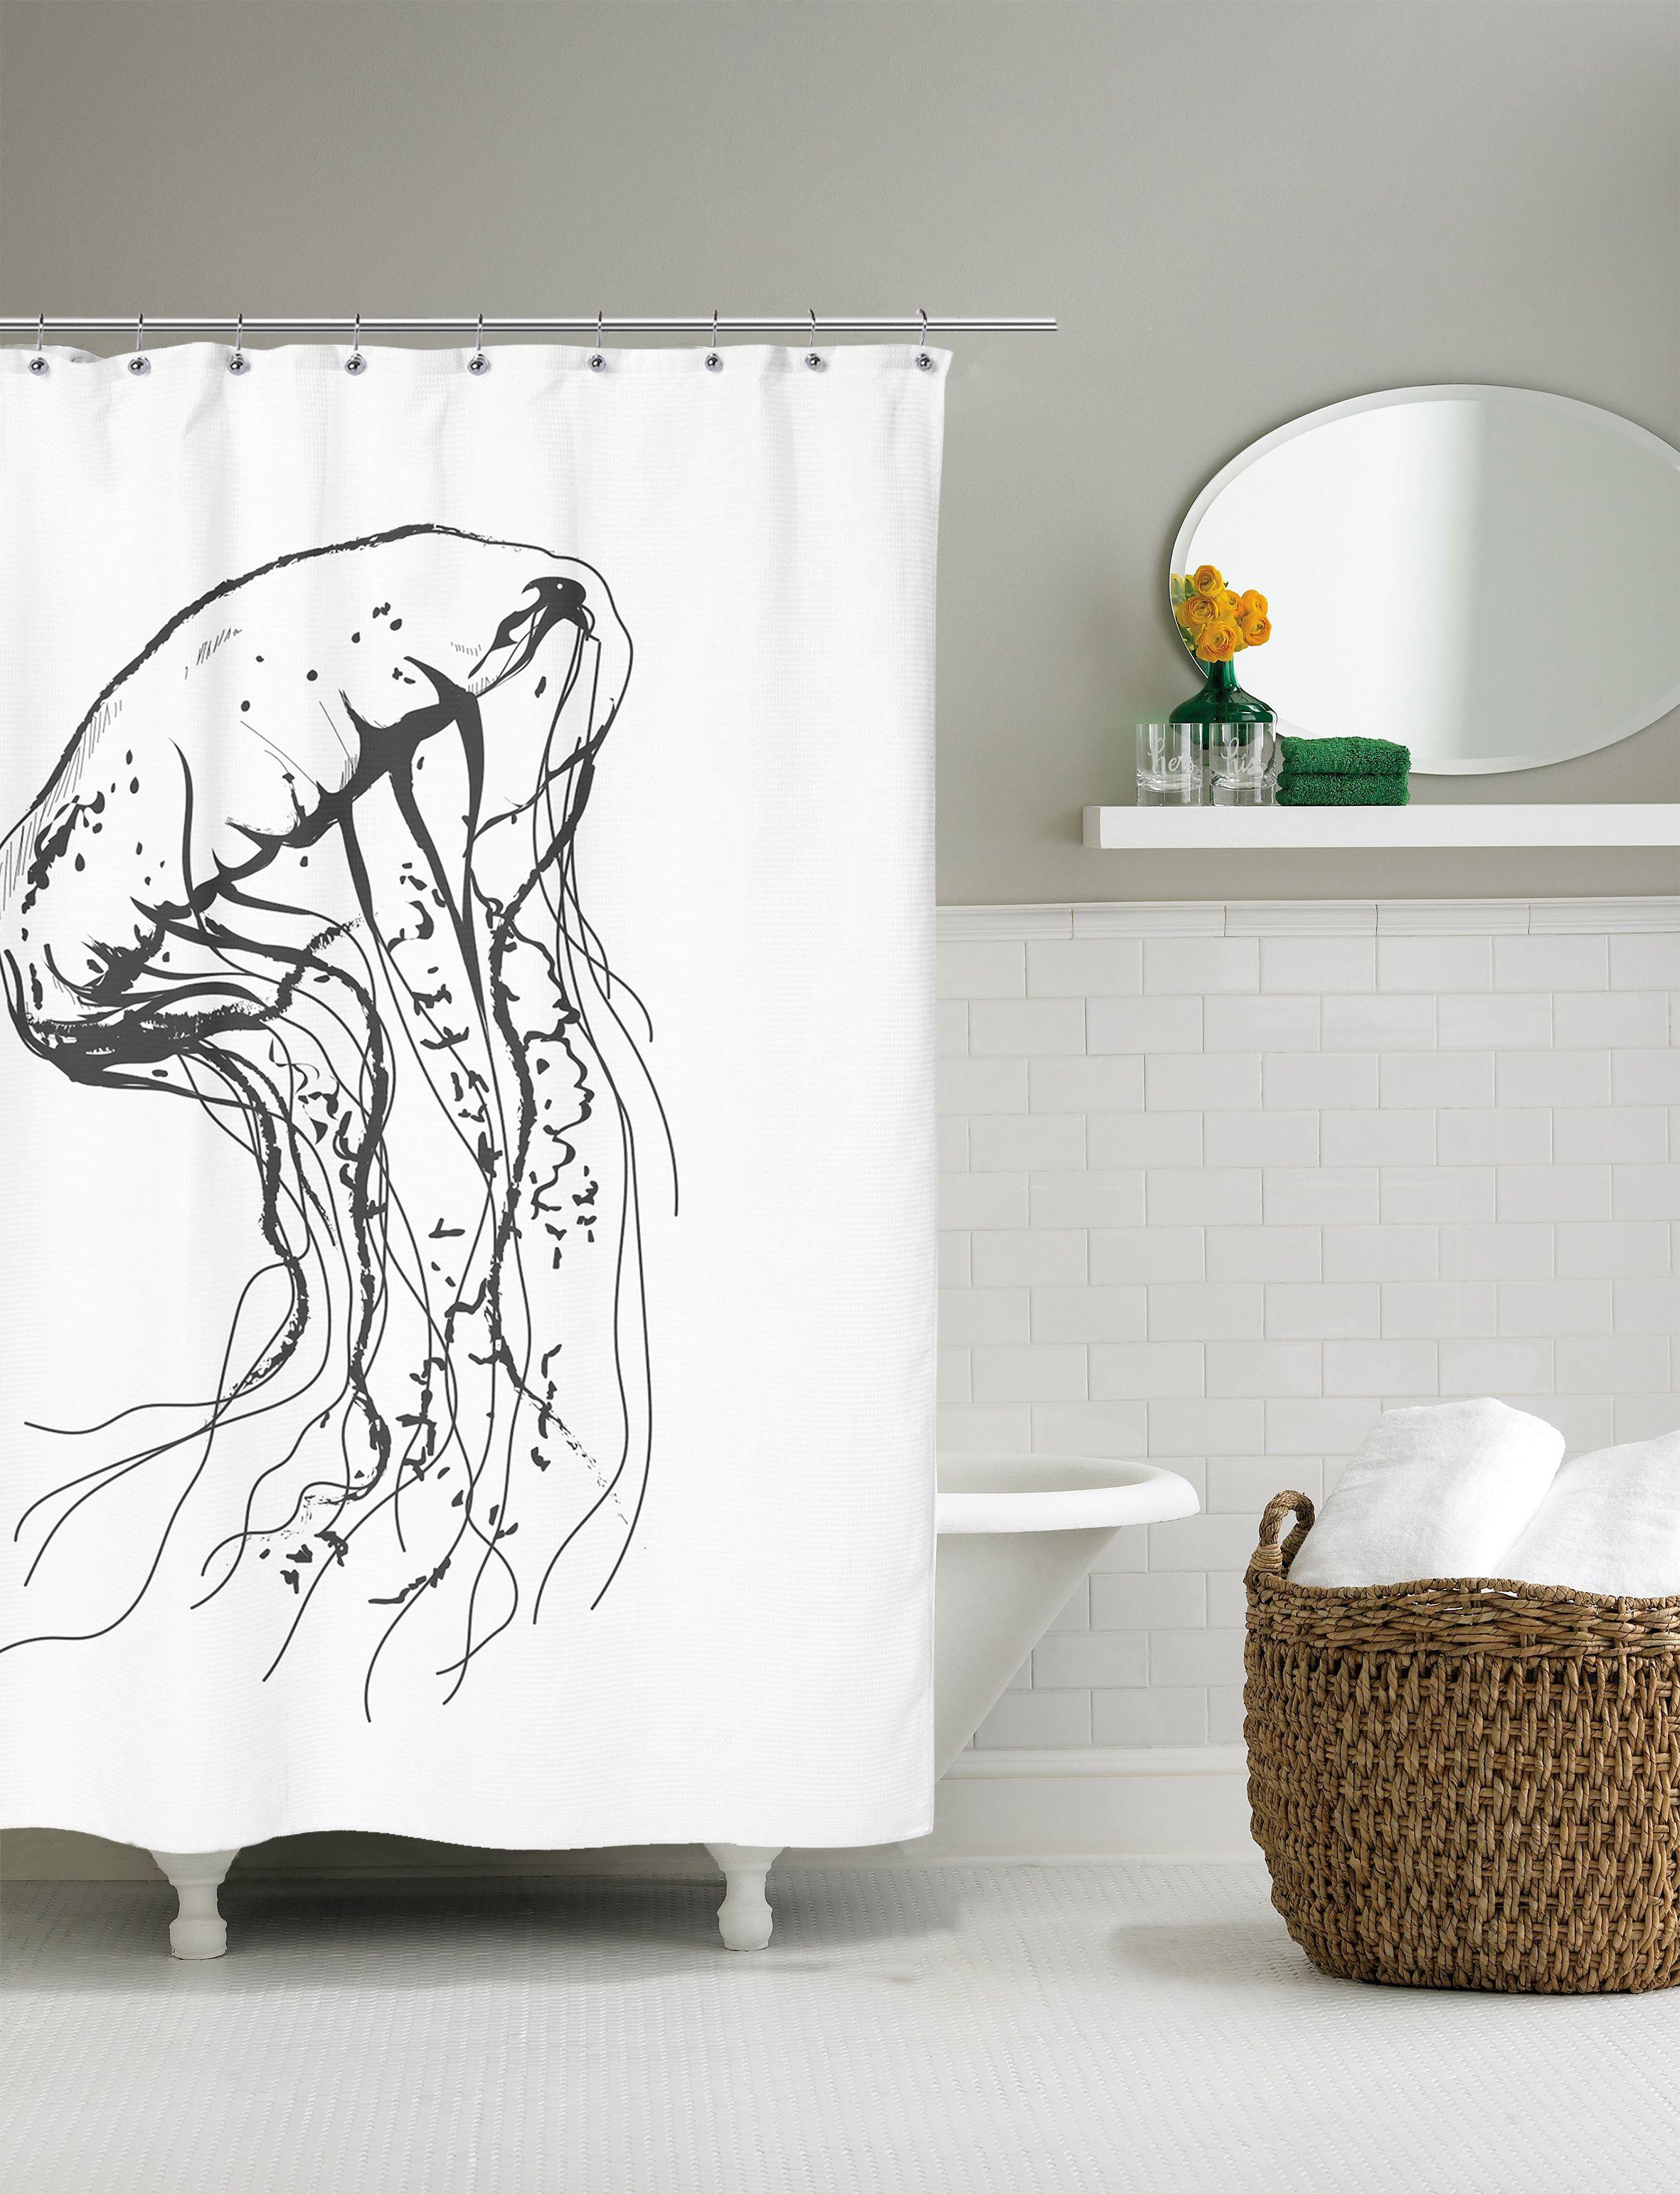 Jellyfish Shower Curtain Size L 200 Cm W 180 Cm